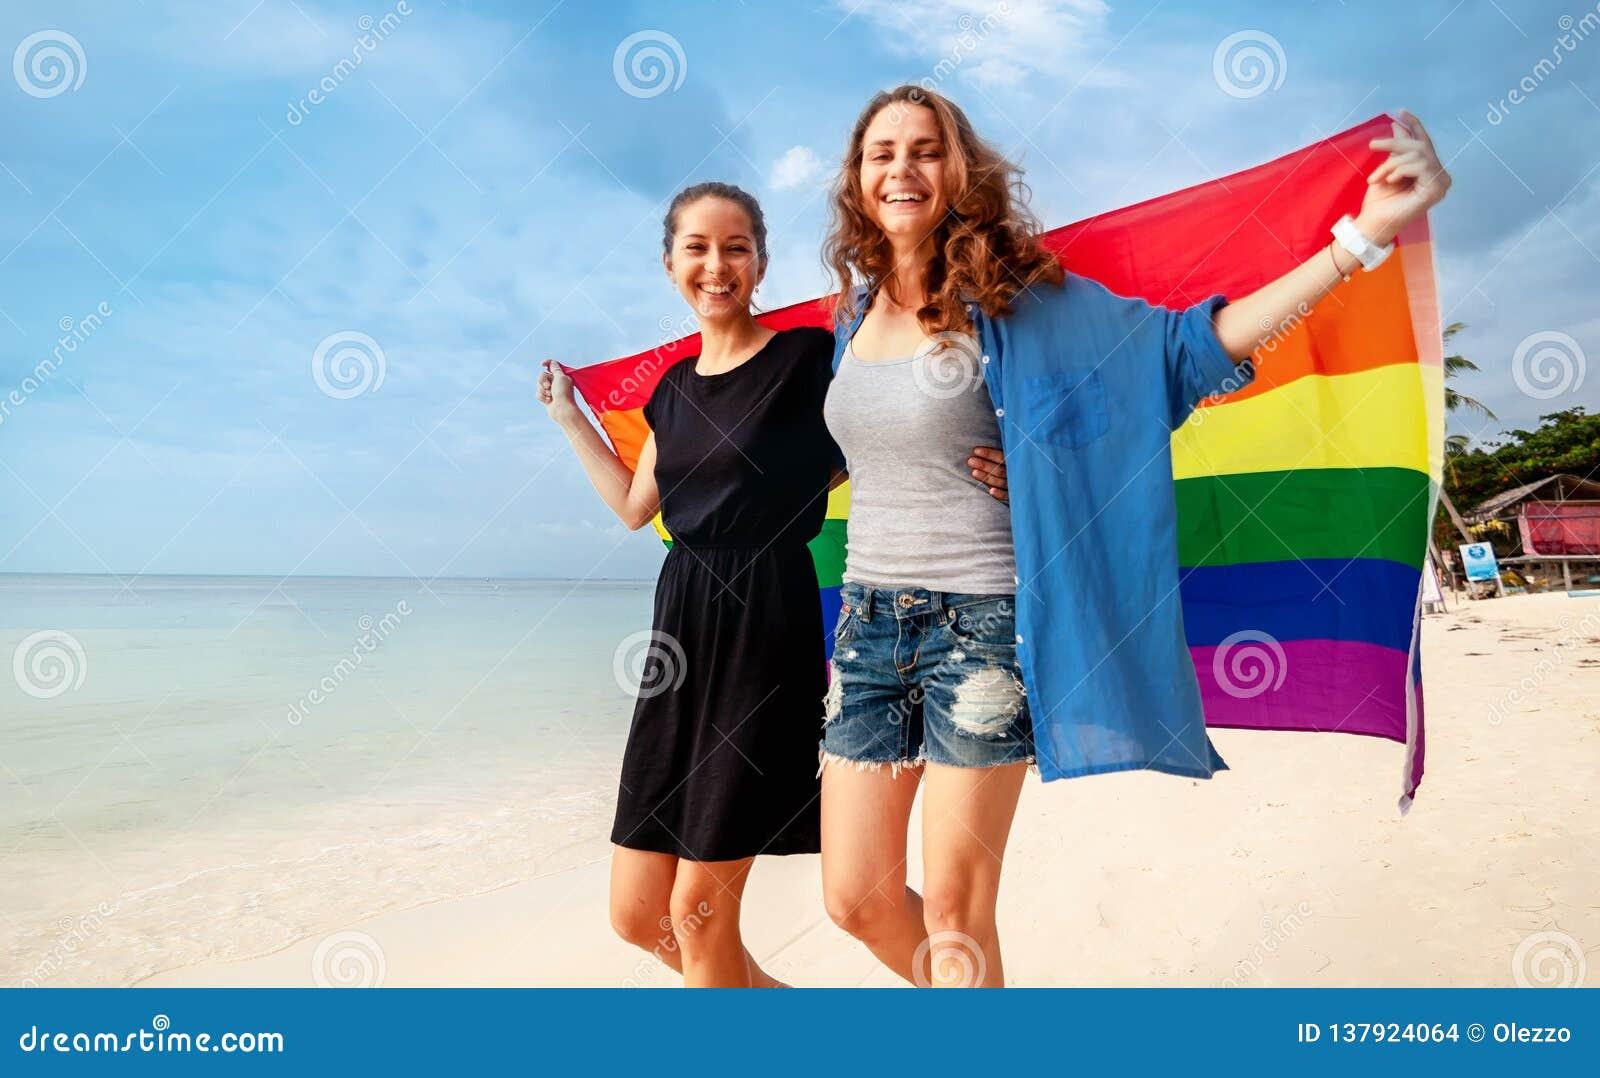 Fotki lezbian